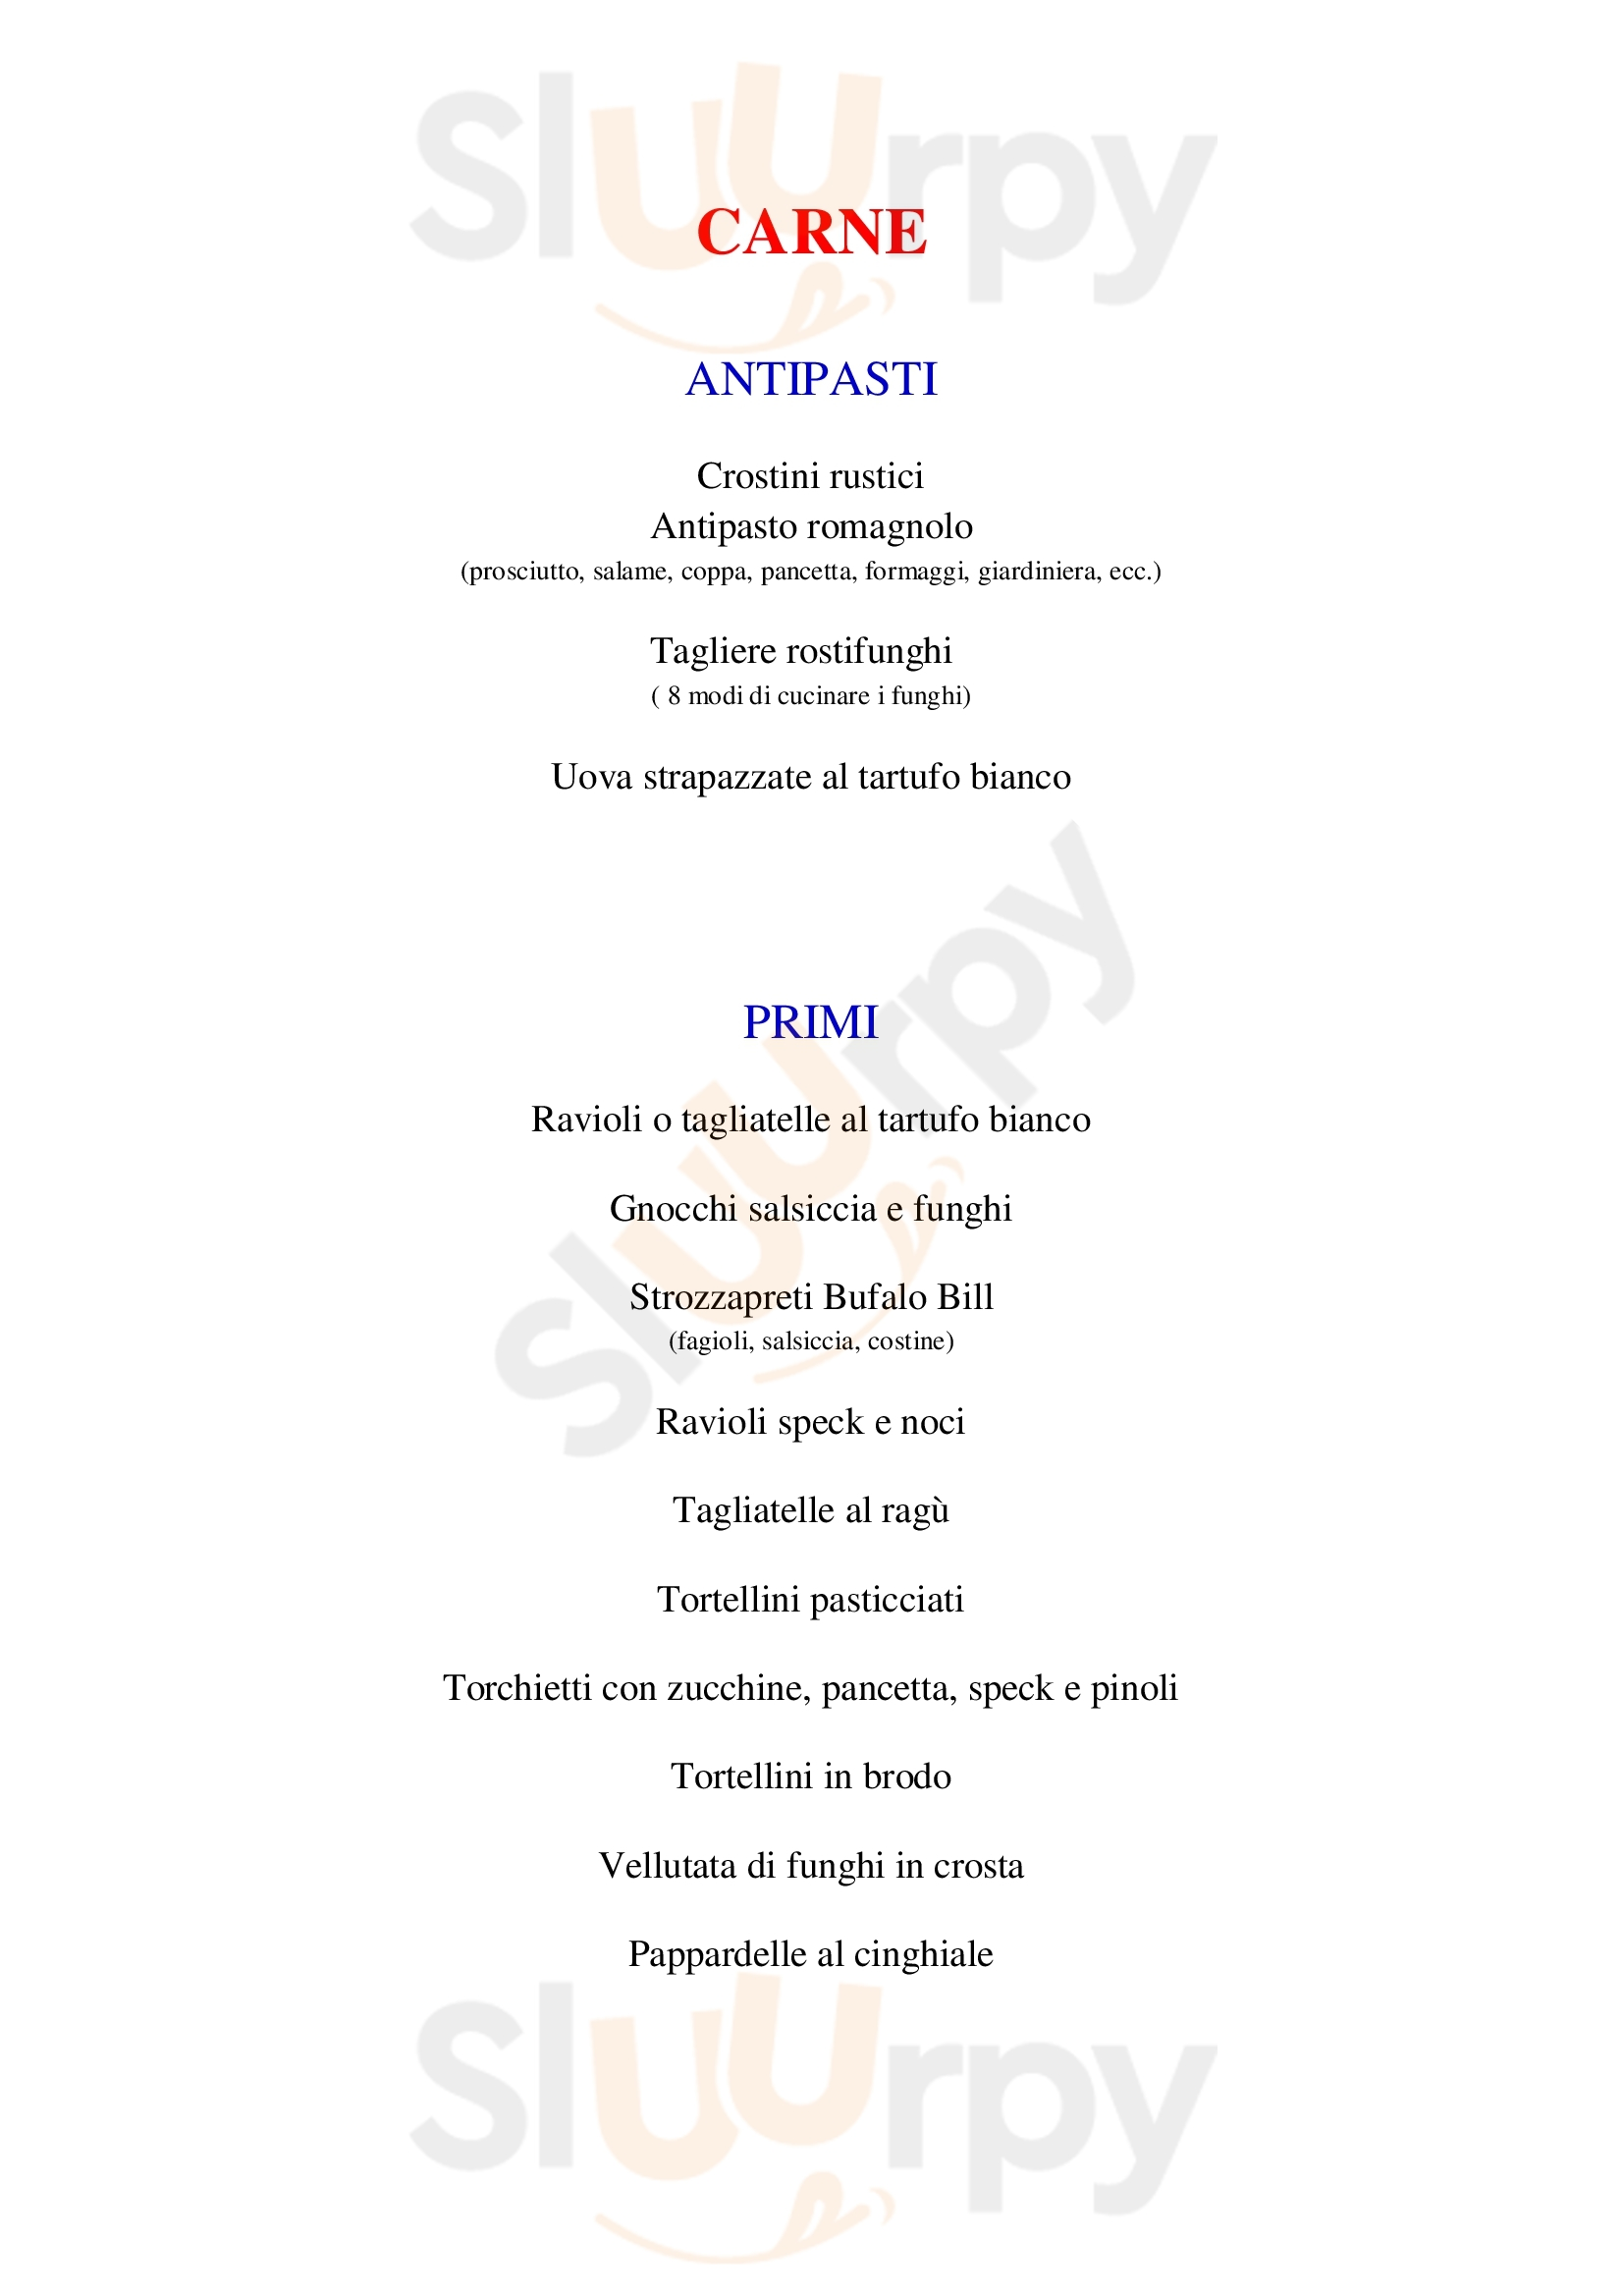 Osteria Tacabanda Riccione menù 1 pagina